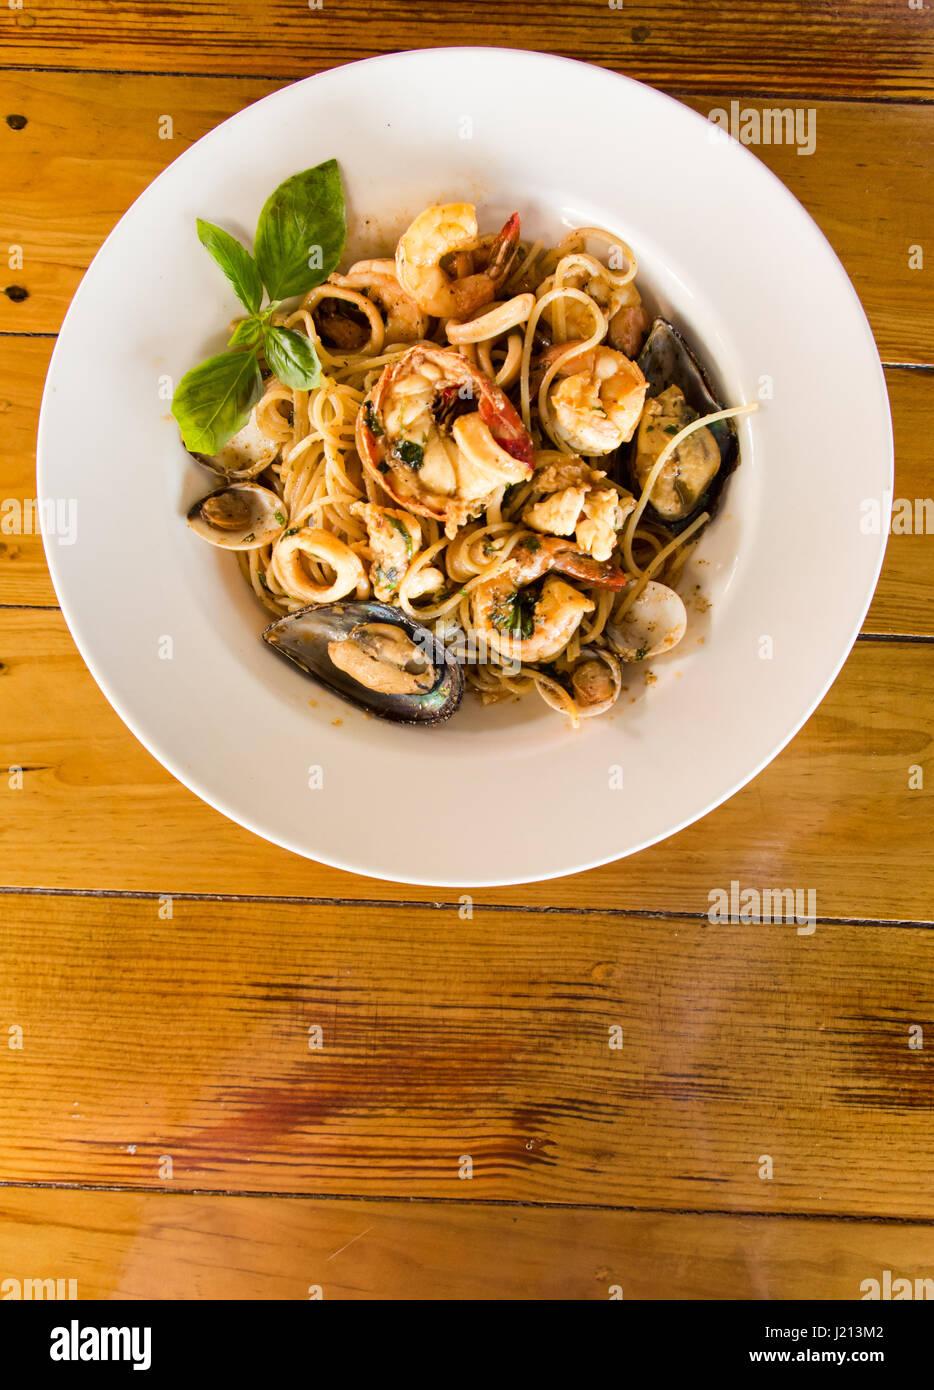 Seafood Pasta - Stock Image